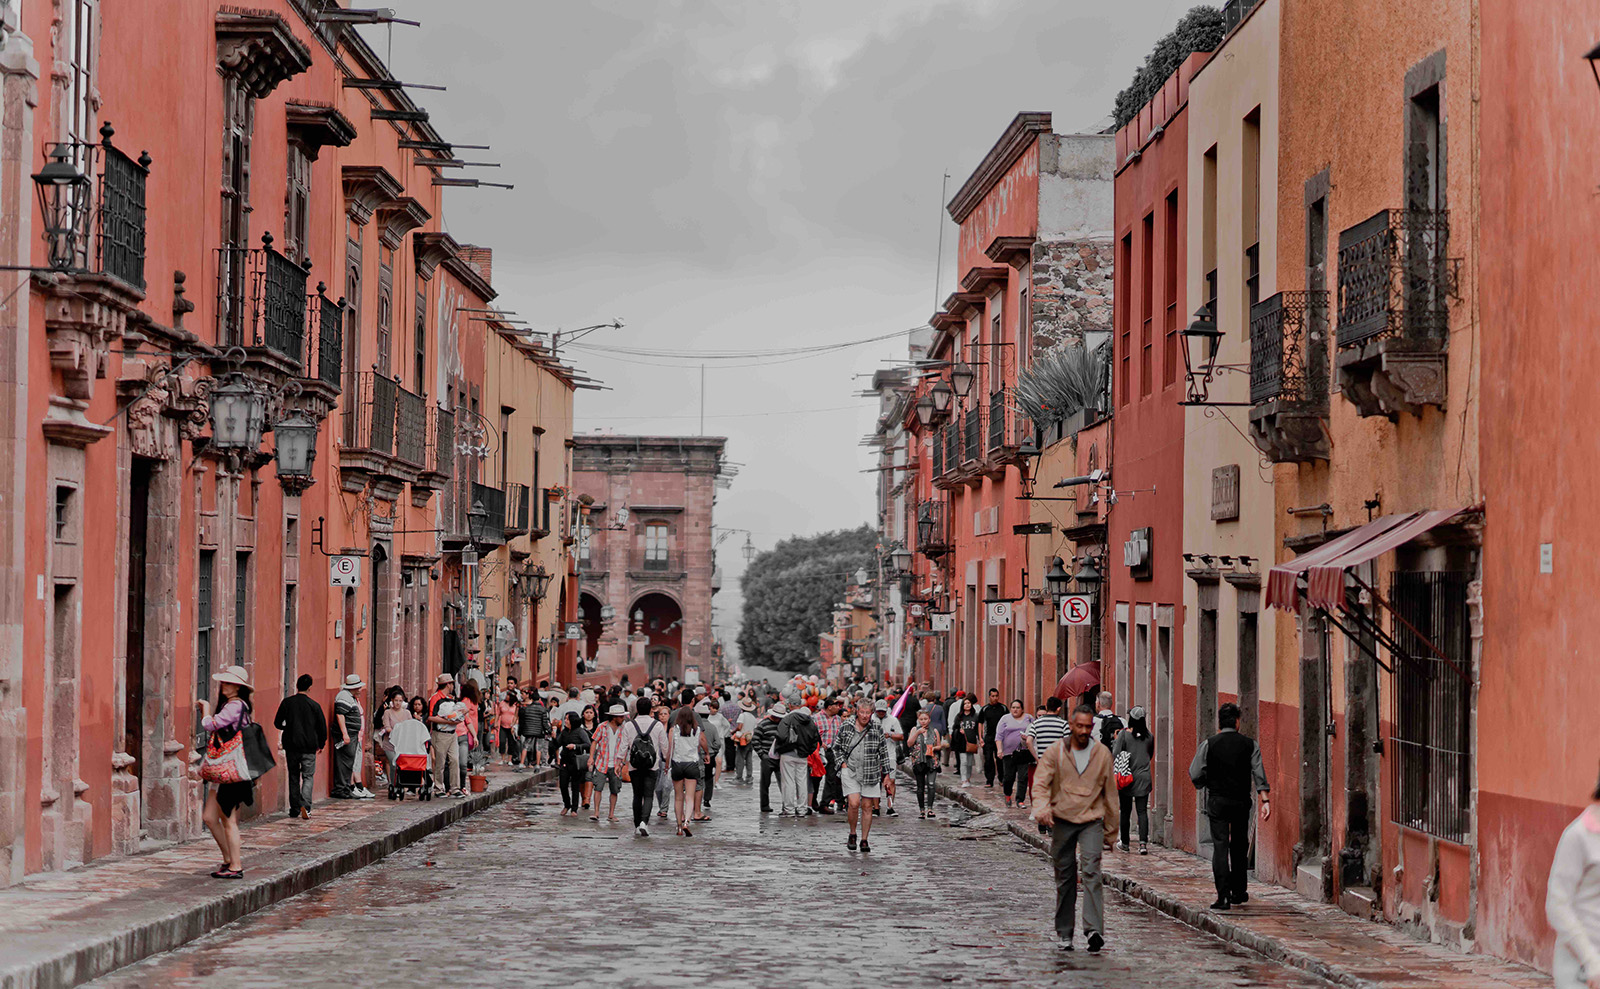 pink buildings on a street in San Miguel de Allende, Mexico